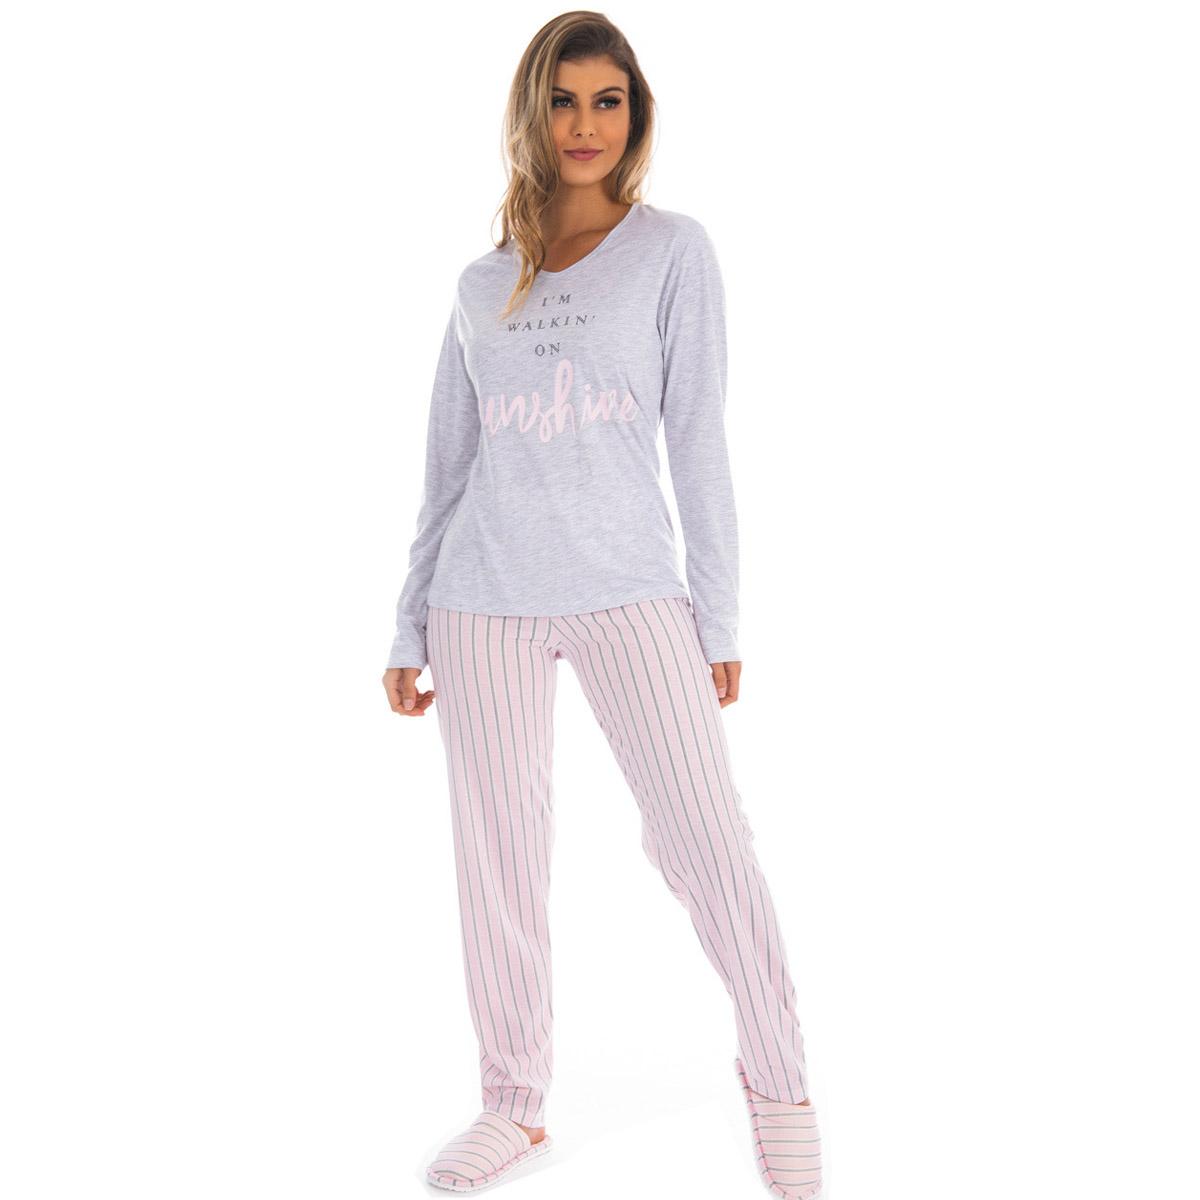 Pijama feminino de inverno PV especial Victory